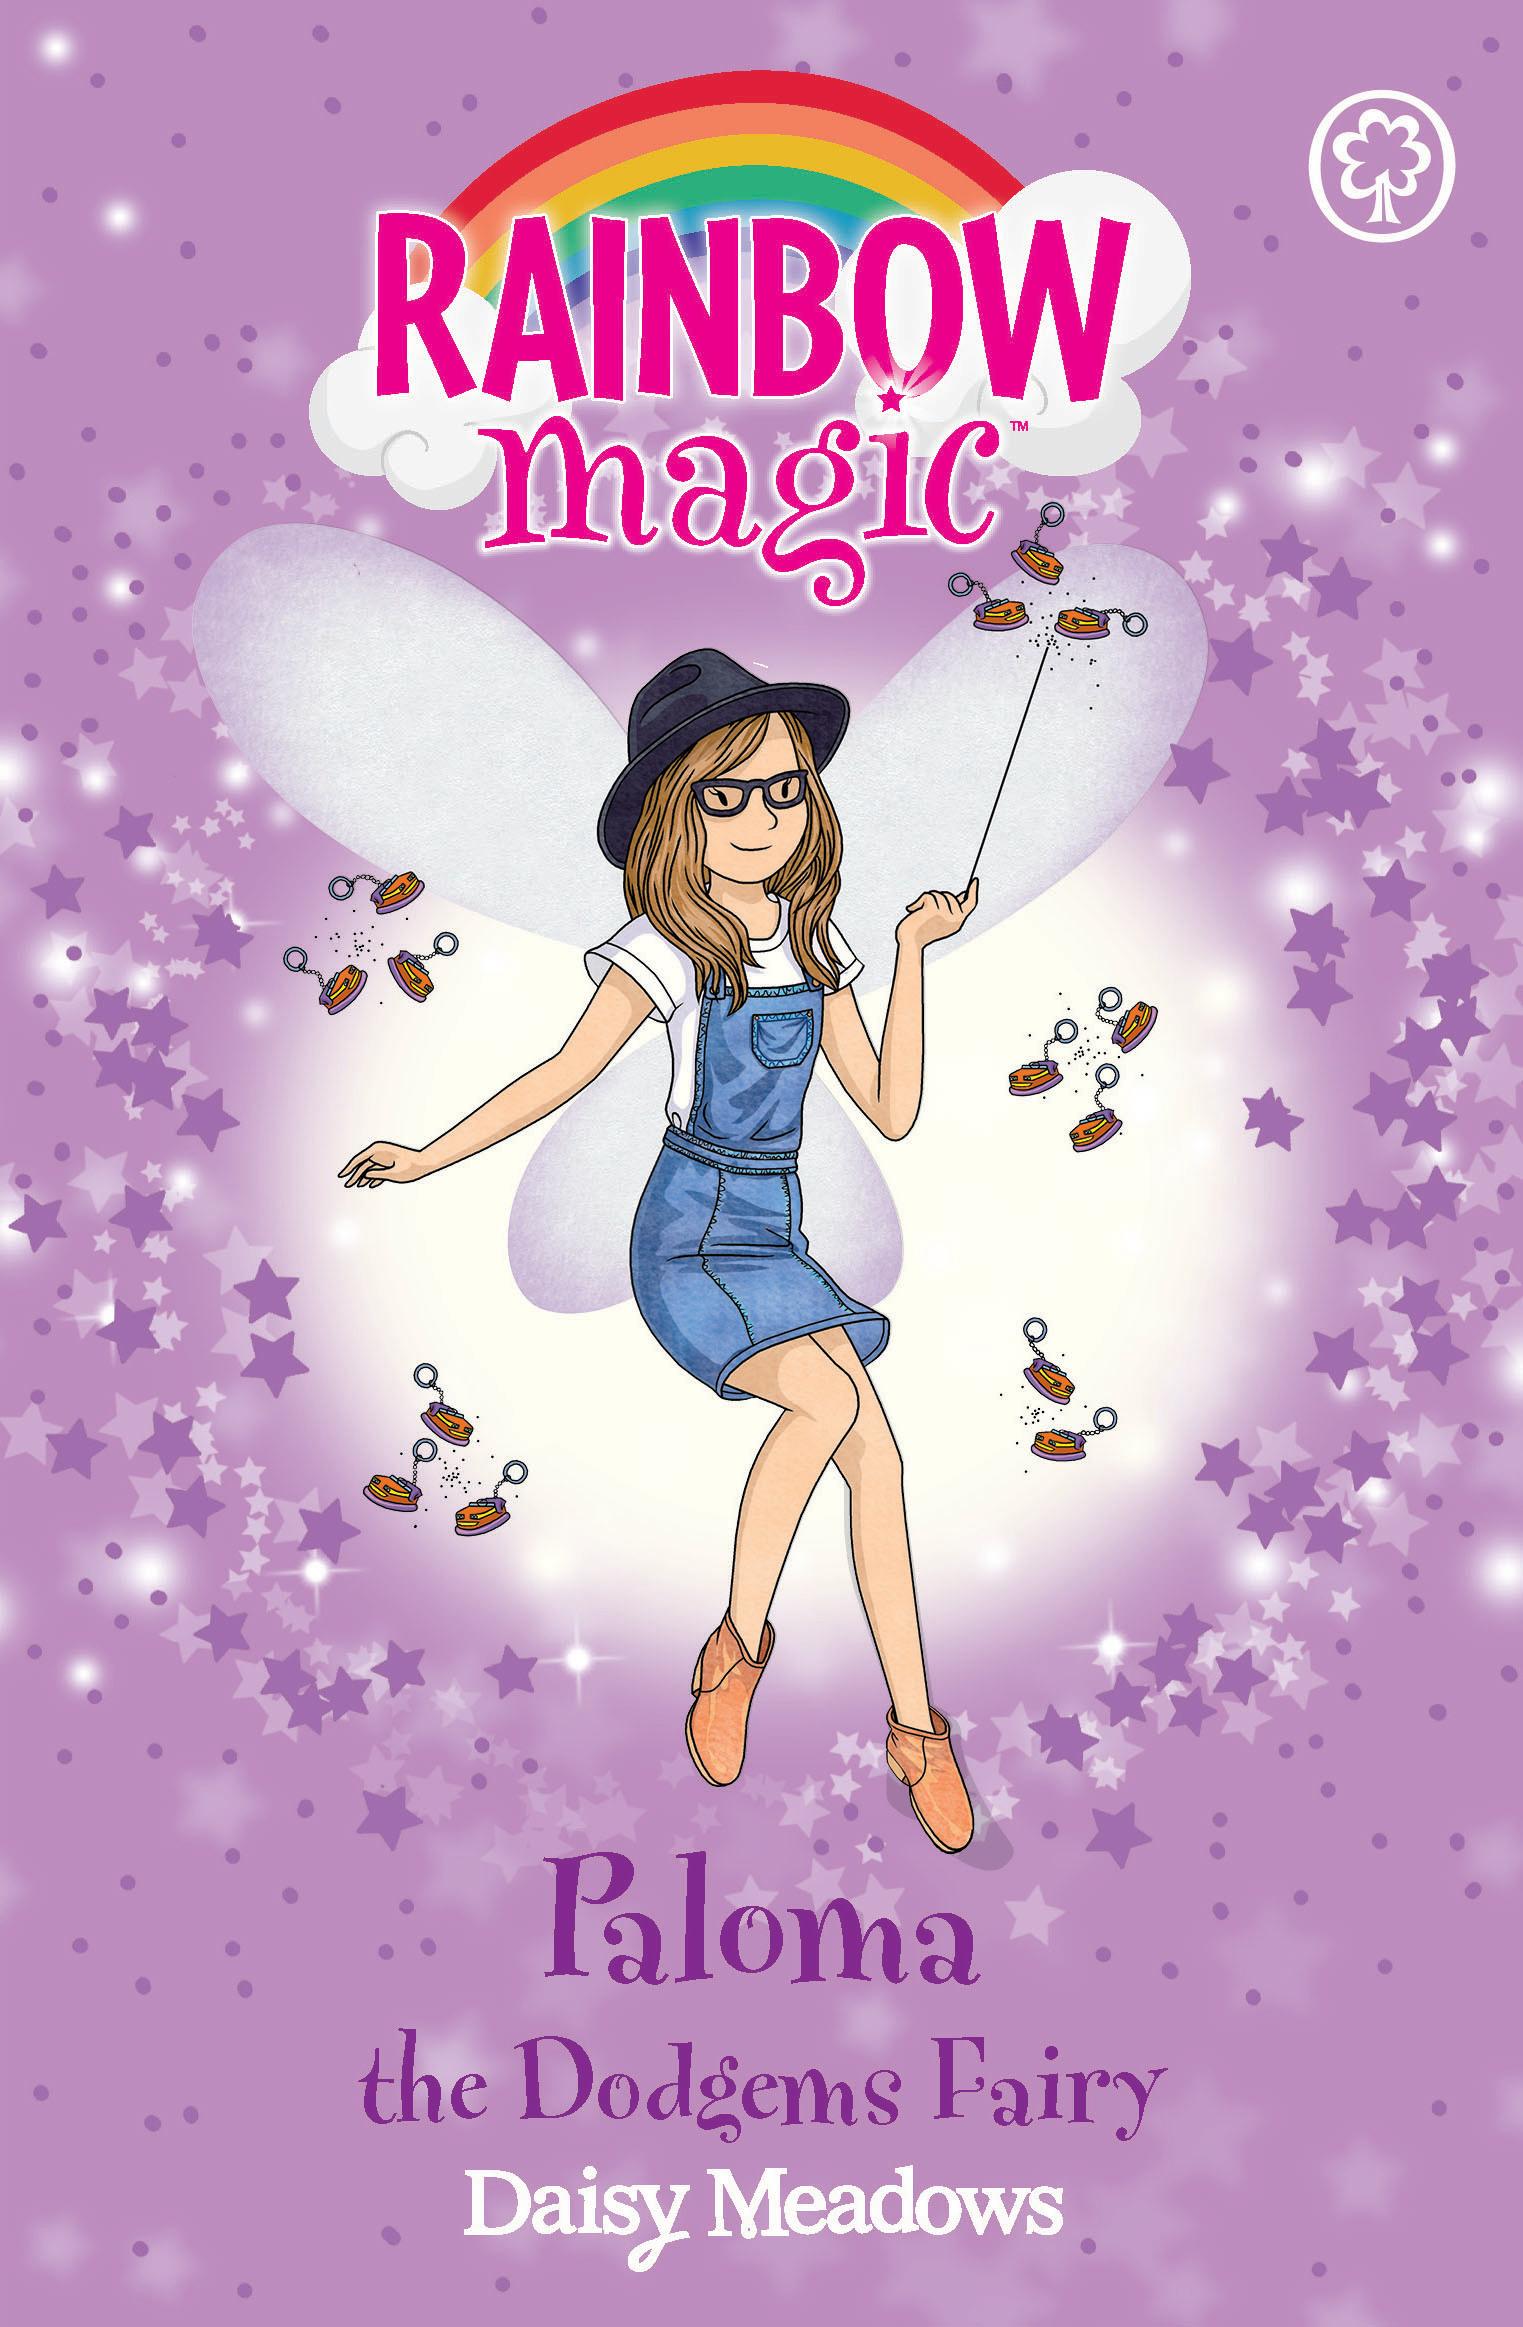 Paloma the Dodgems Fairy Rainbow Magic Wiki Fandom